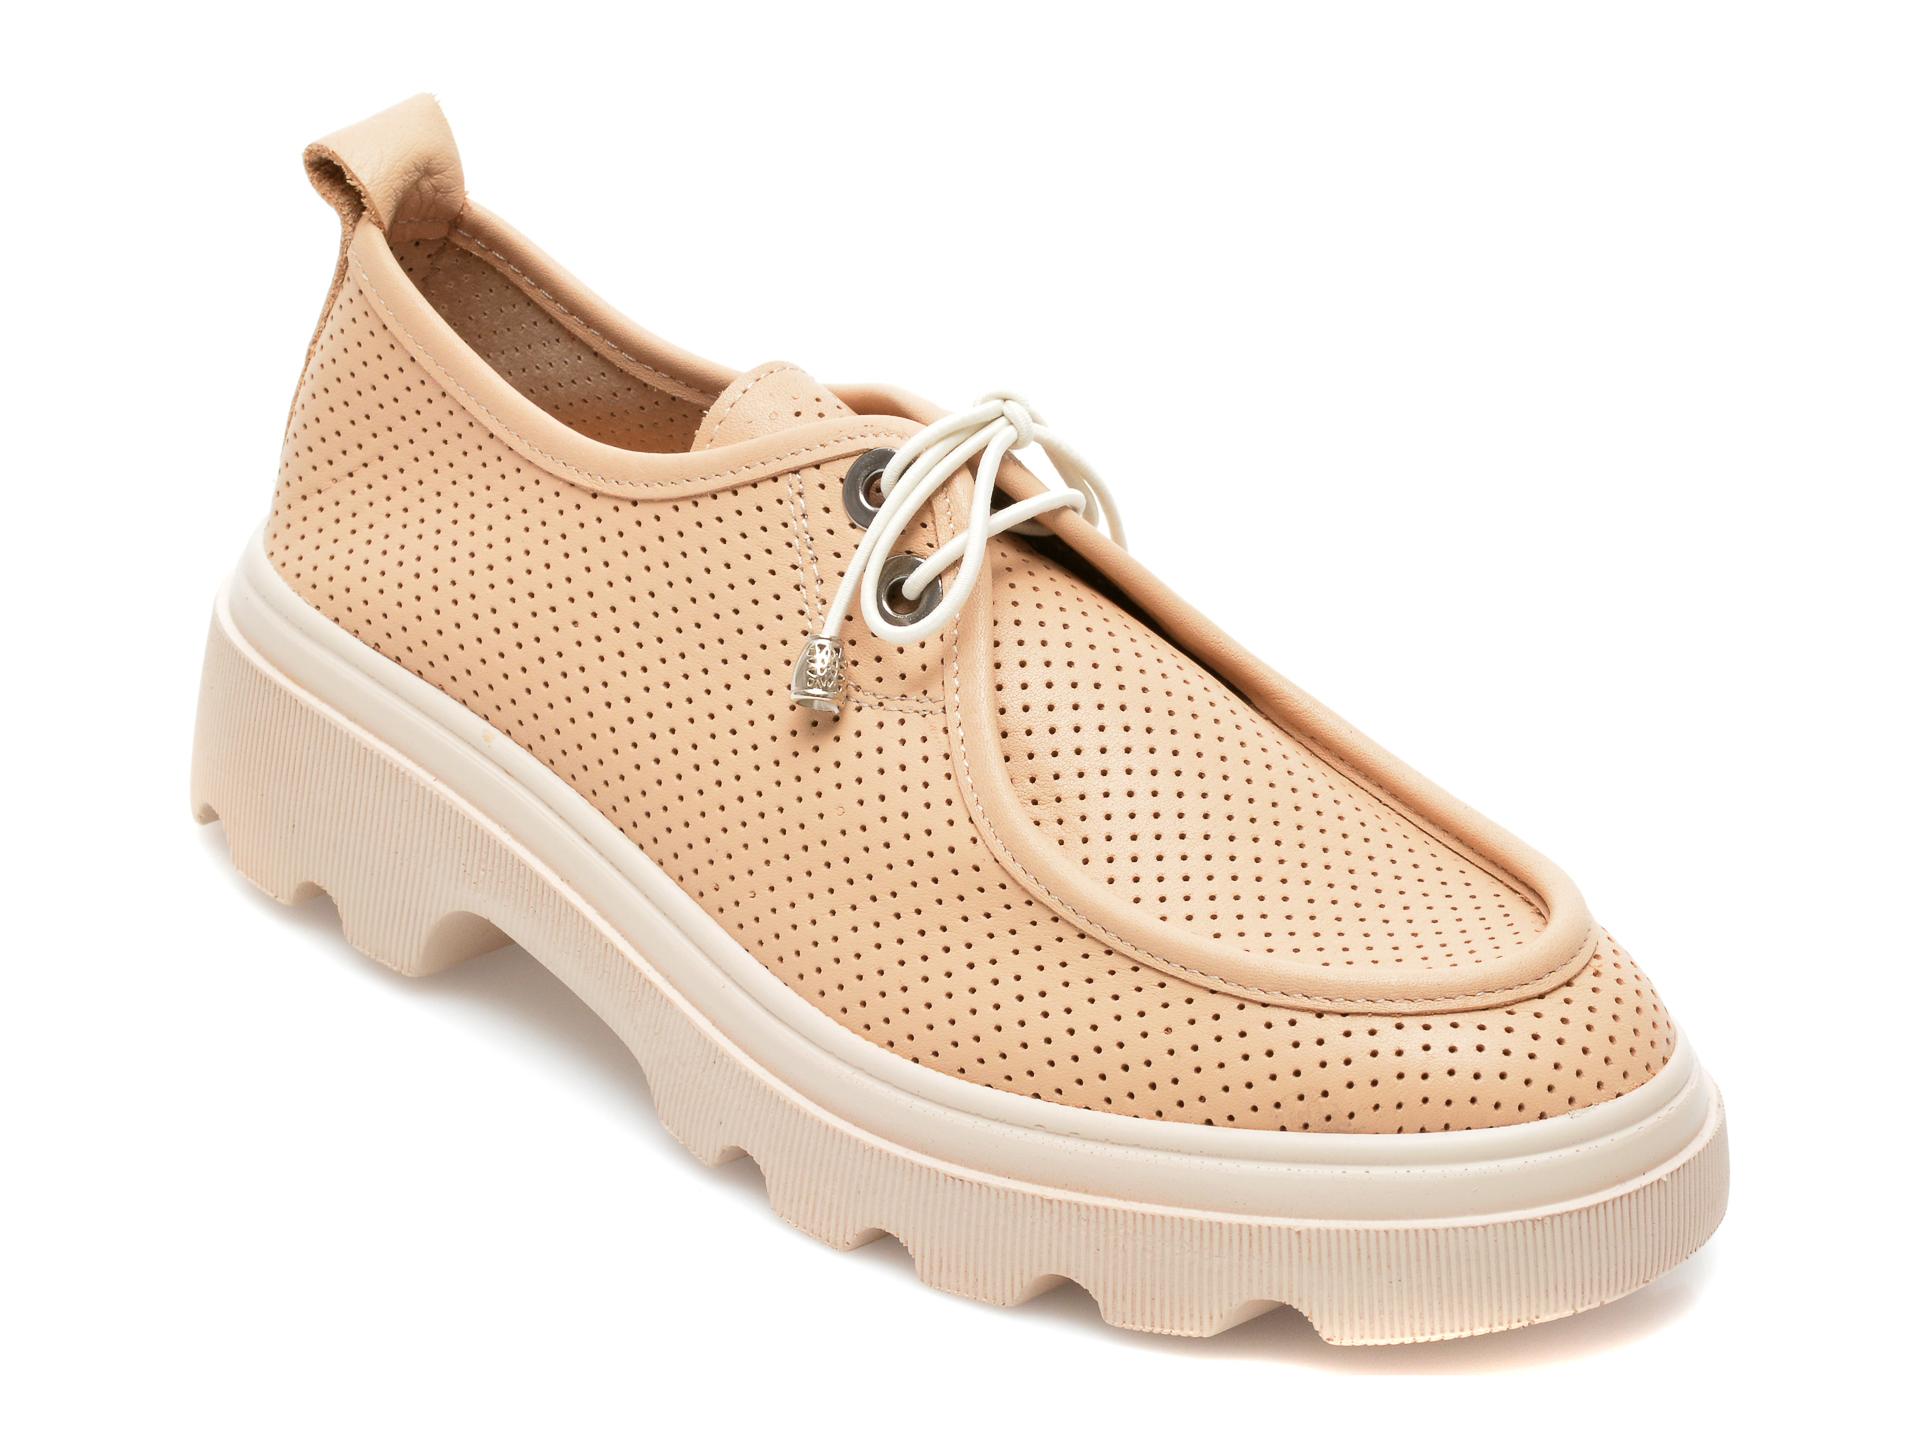 Pantofi GRYXX bej, 195802, din piele naturala